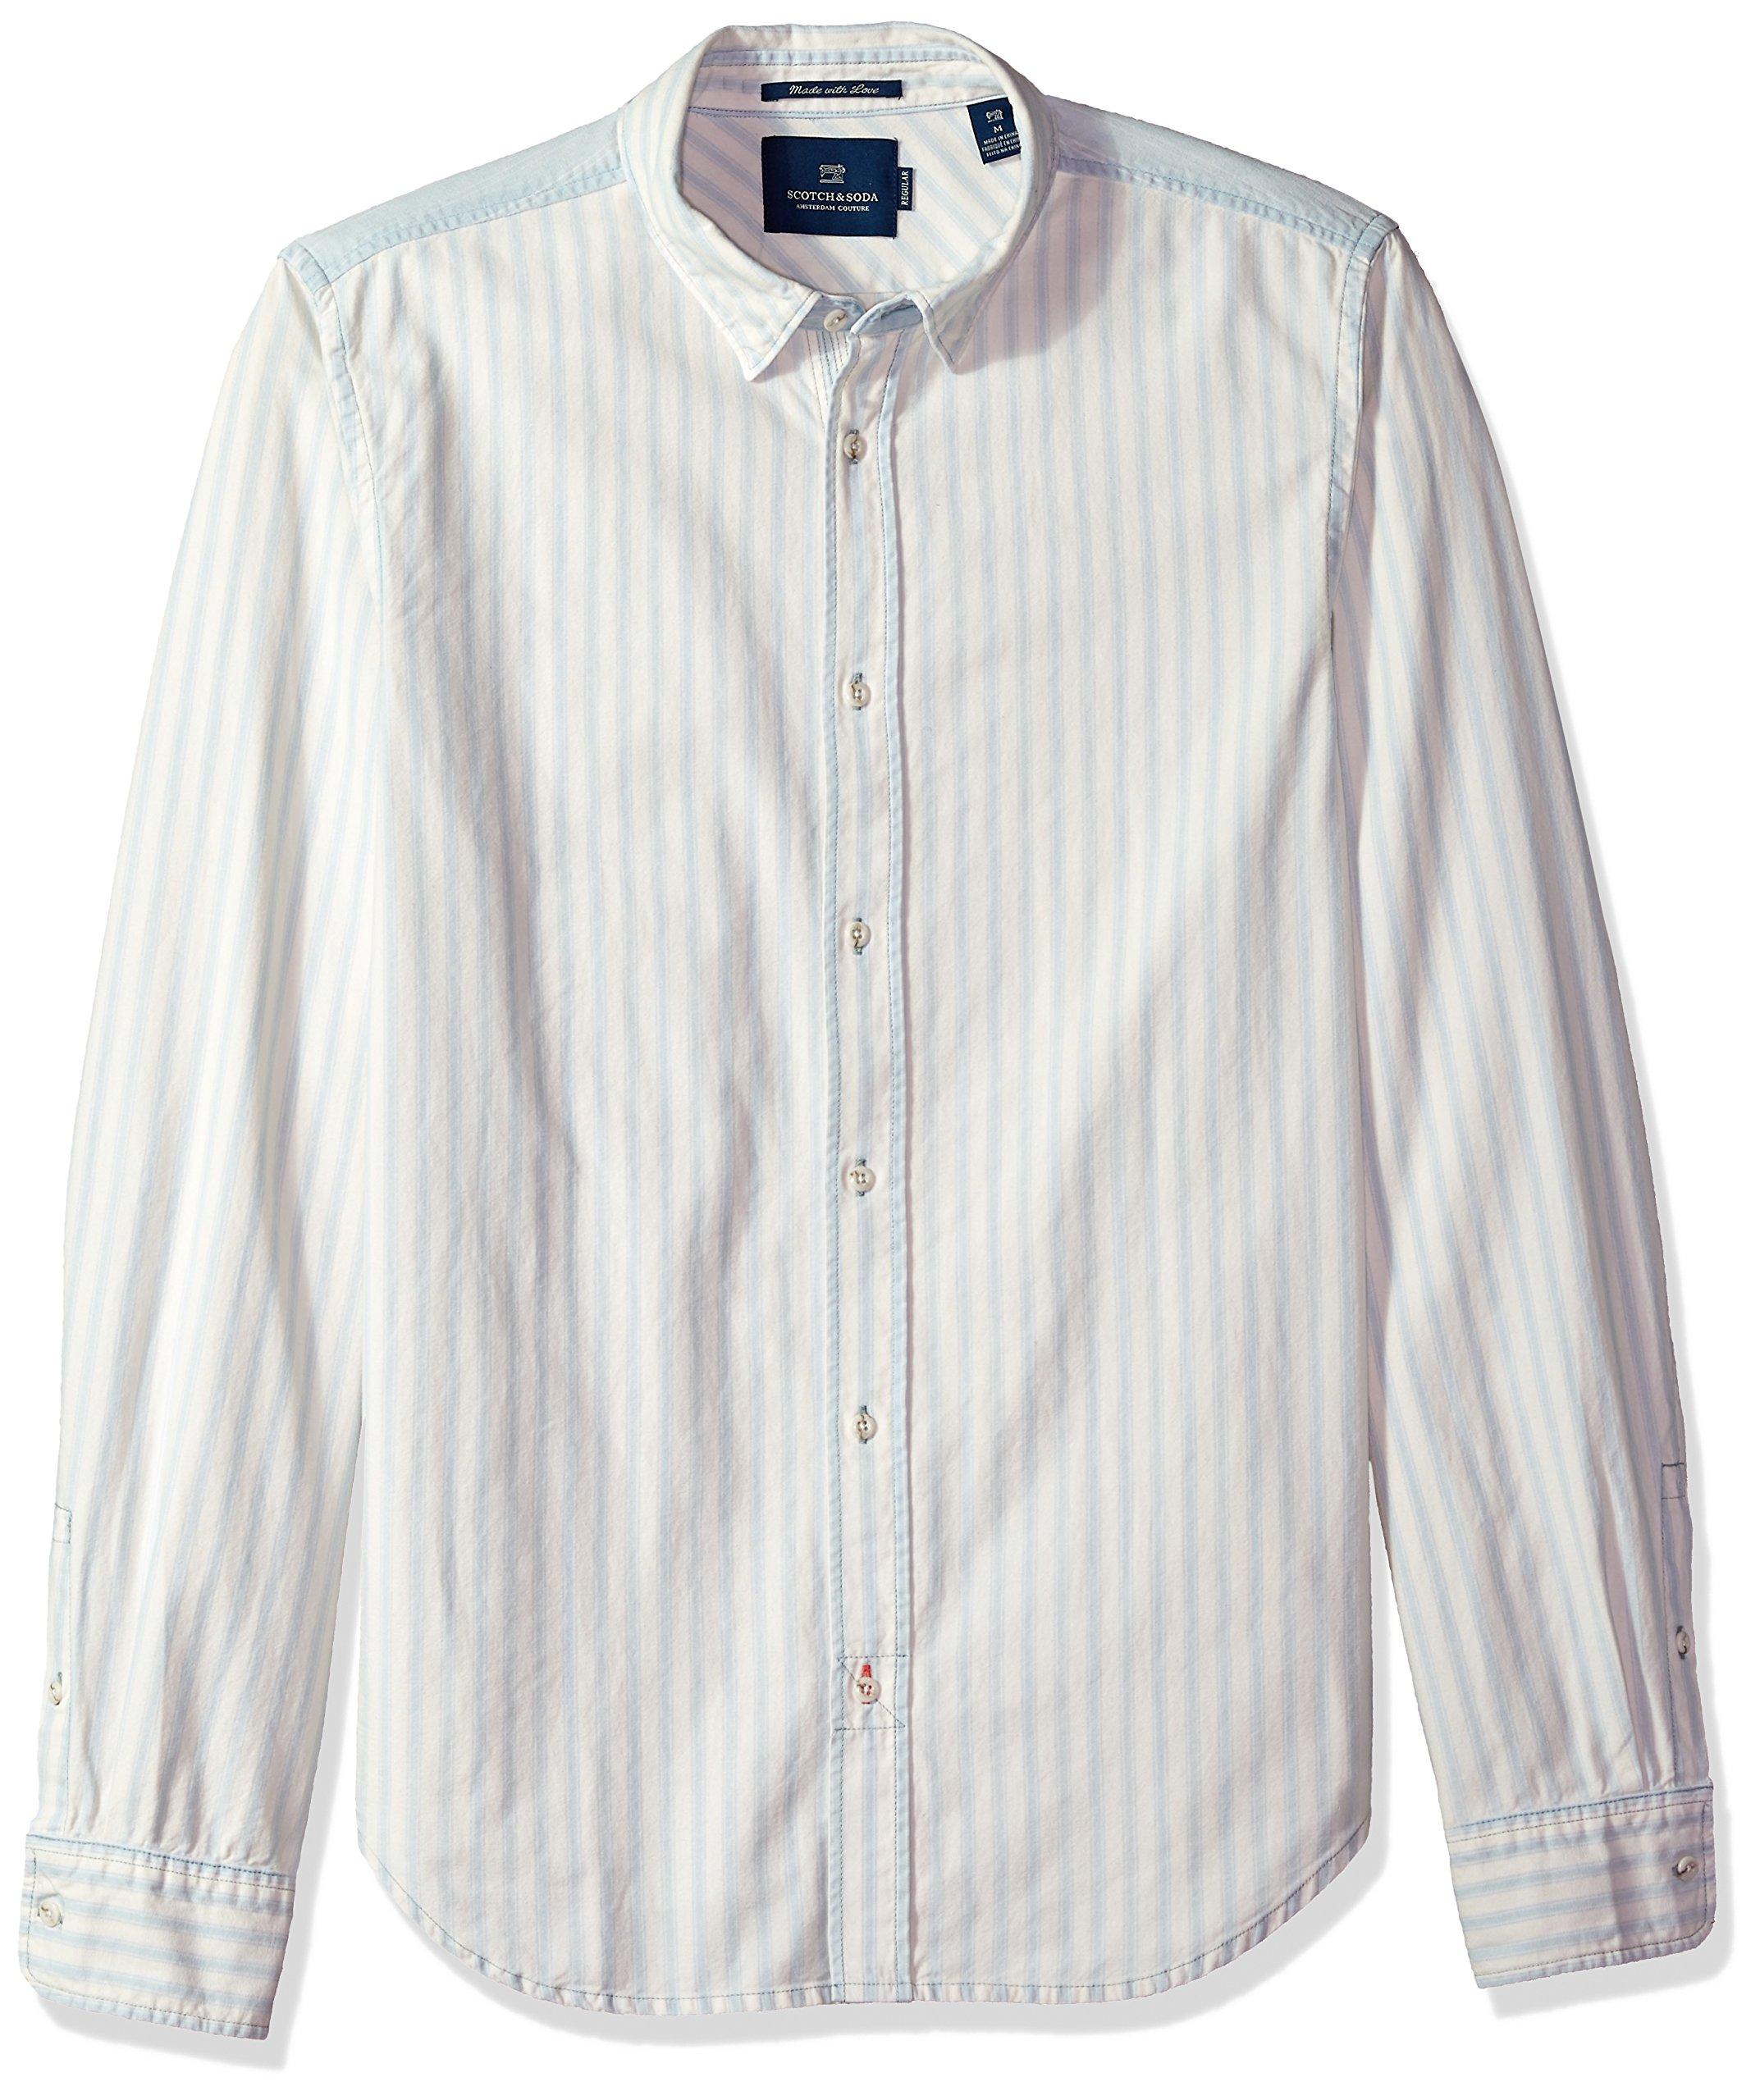 Scotch & Soda Men's Classic Summer Indigo Shirt, Combo a, L